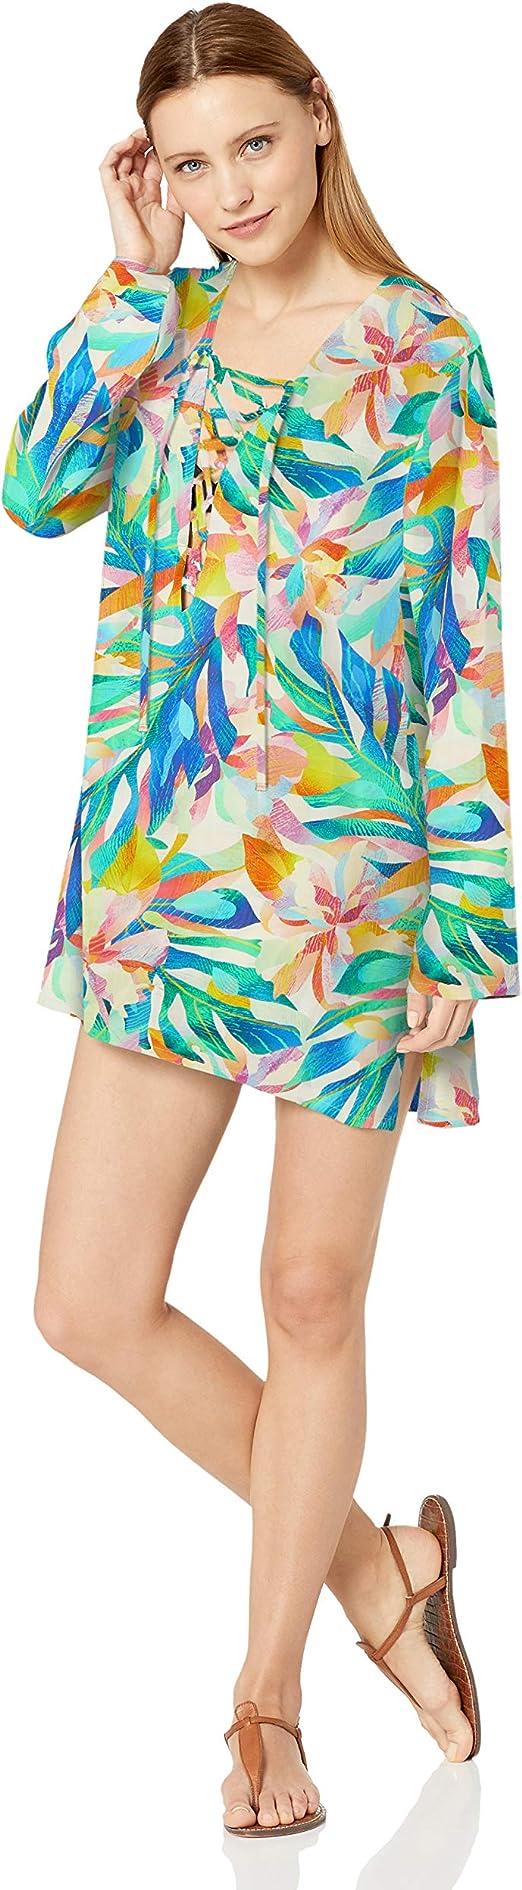 Valia Rainforest Tunic Women/'s Clothing